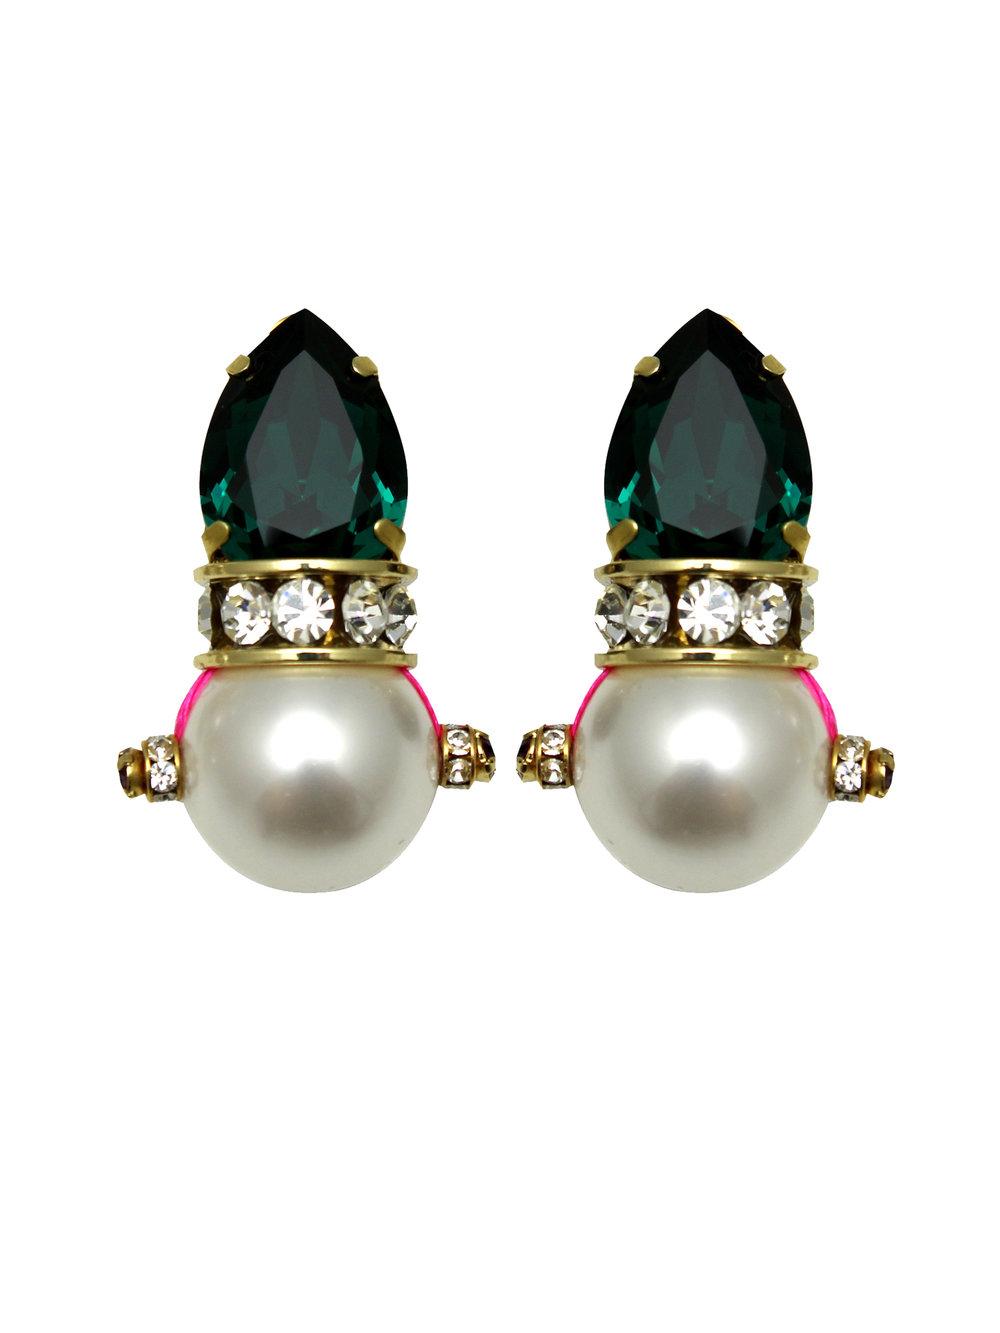 180E-GW Aragon Earrings - Green_White.jpg